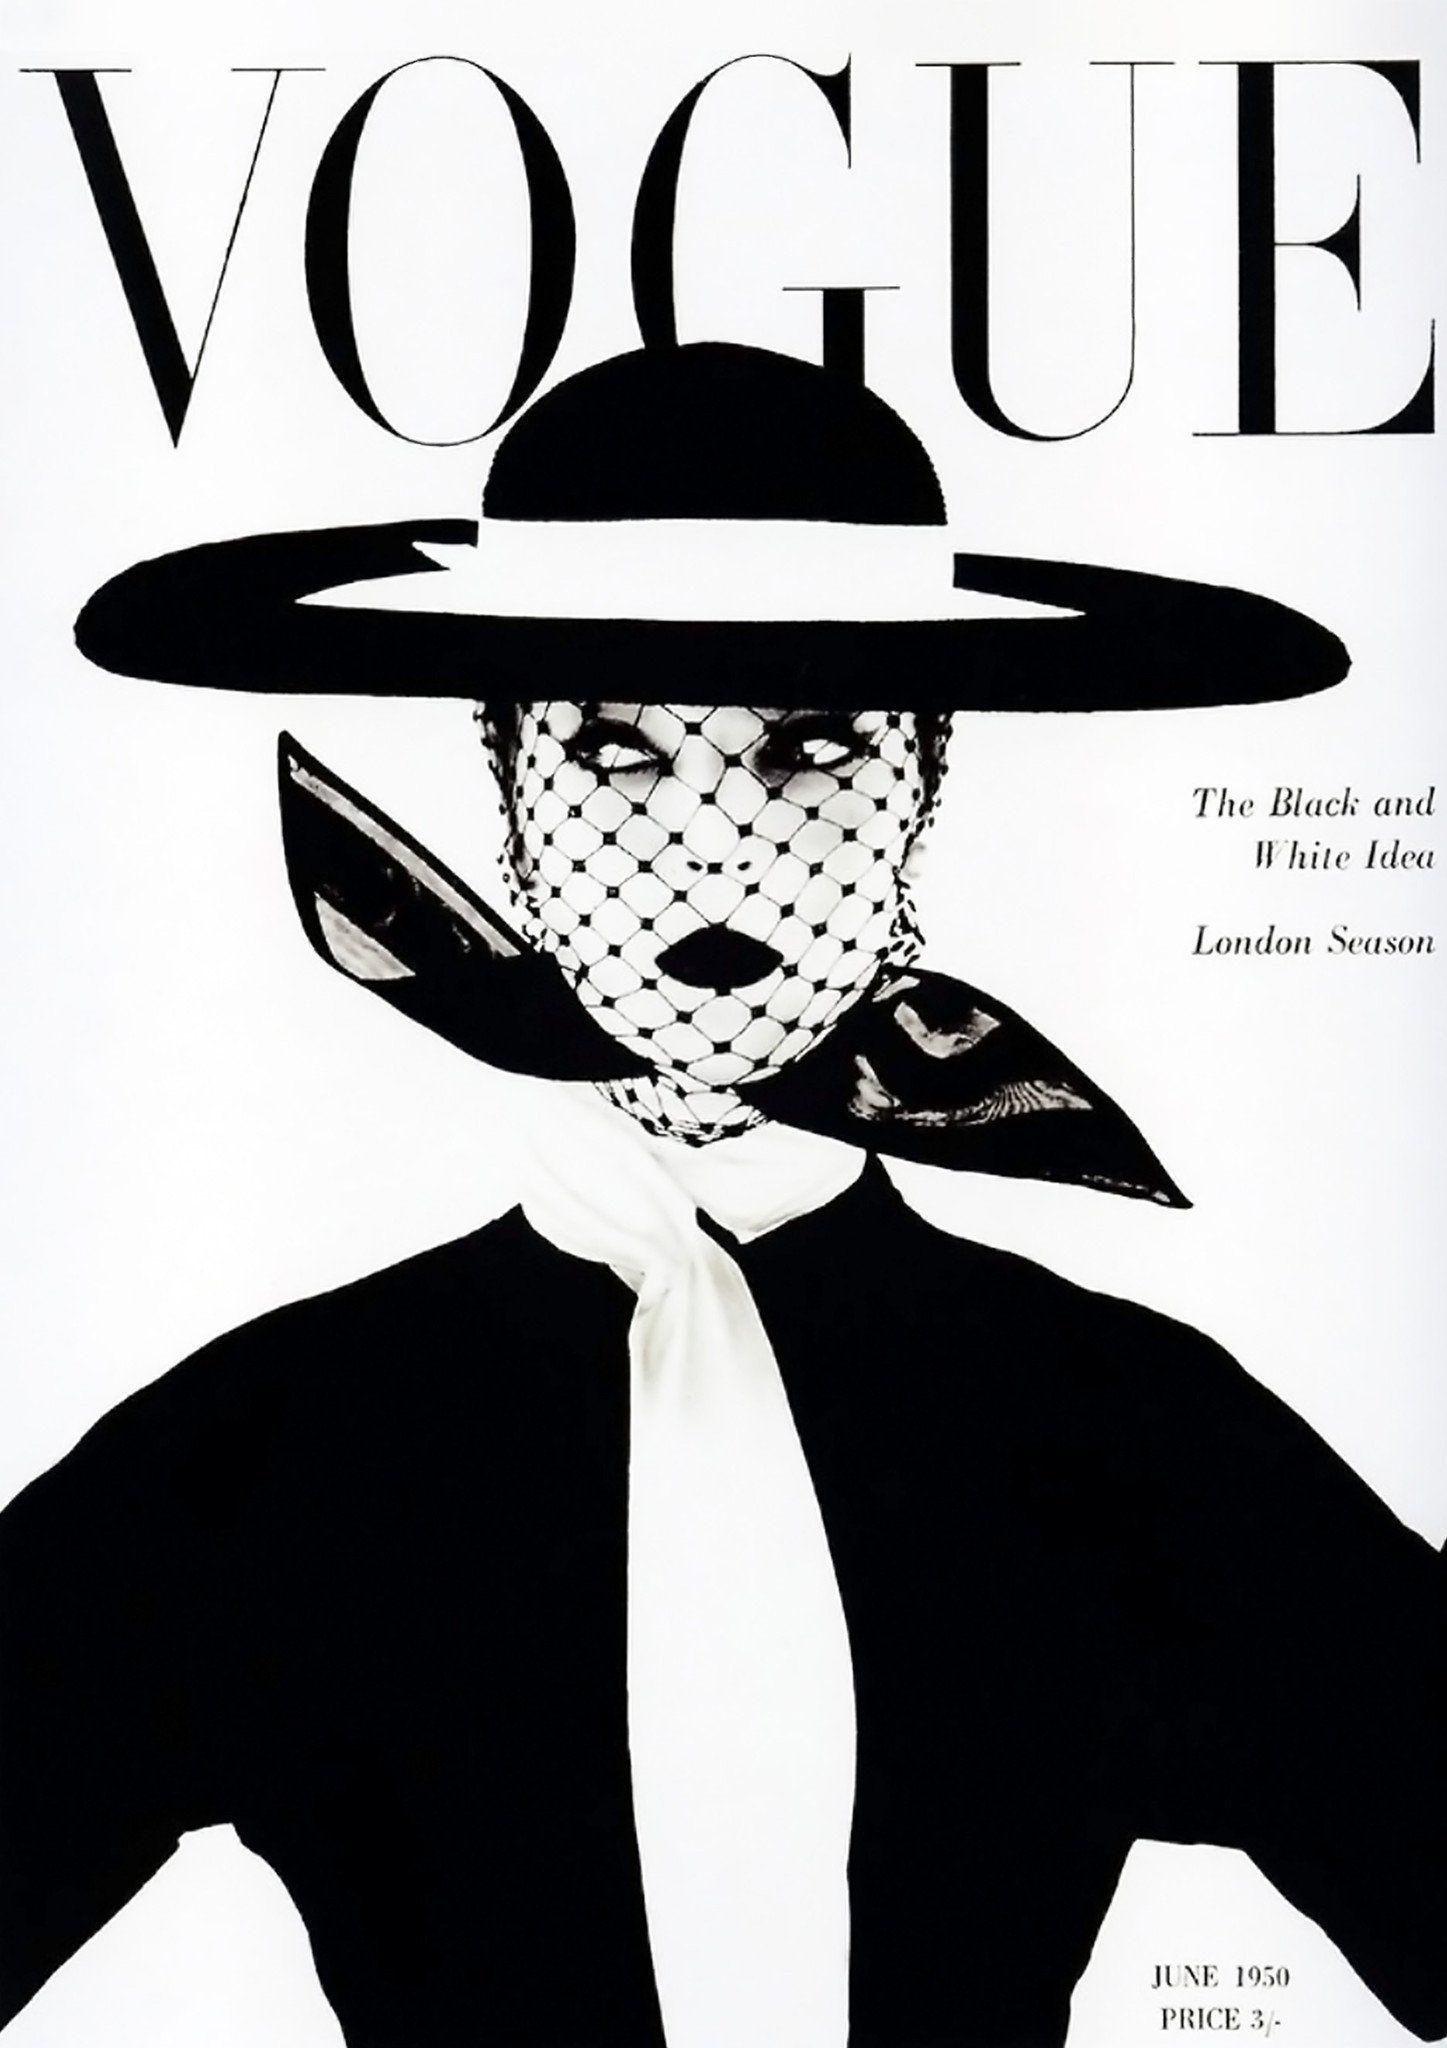 Vogue magazine cover vintage black and white fashion art